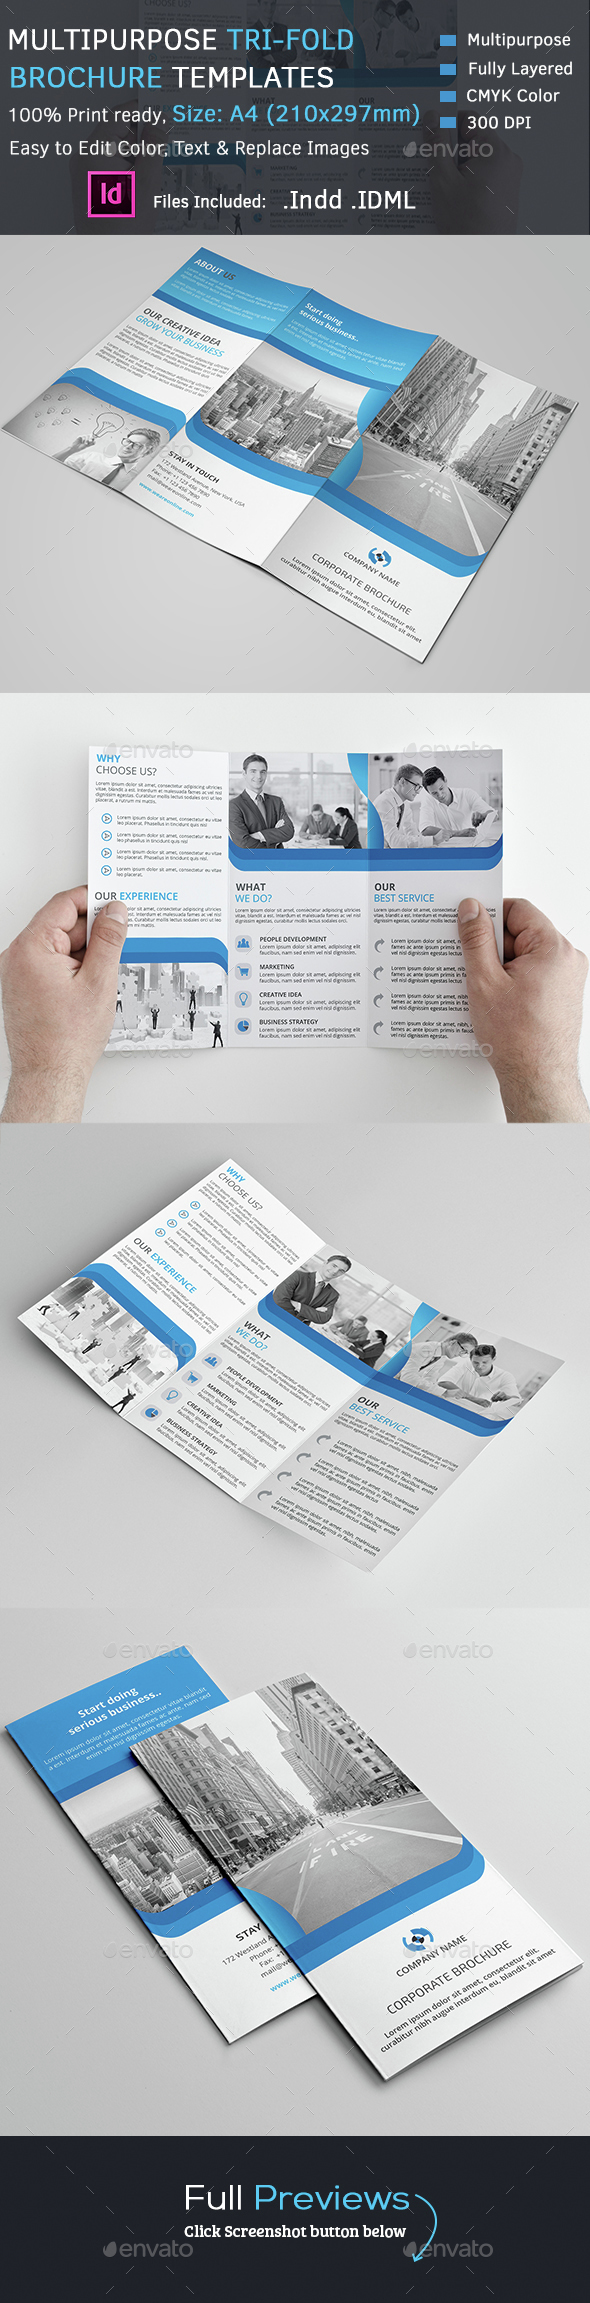 Multipurpose Tri-Fold Brochure - Corporate Brochures